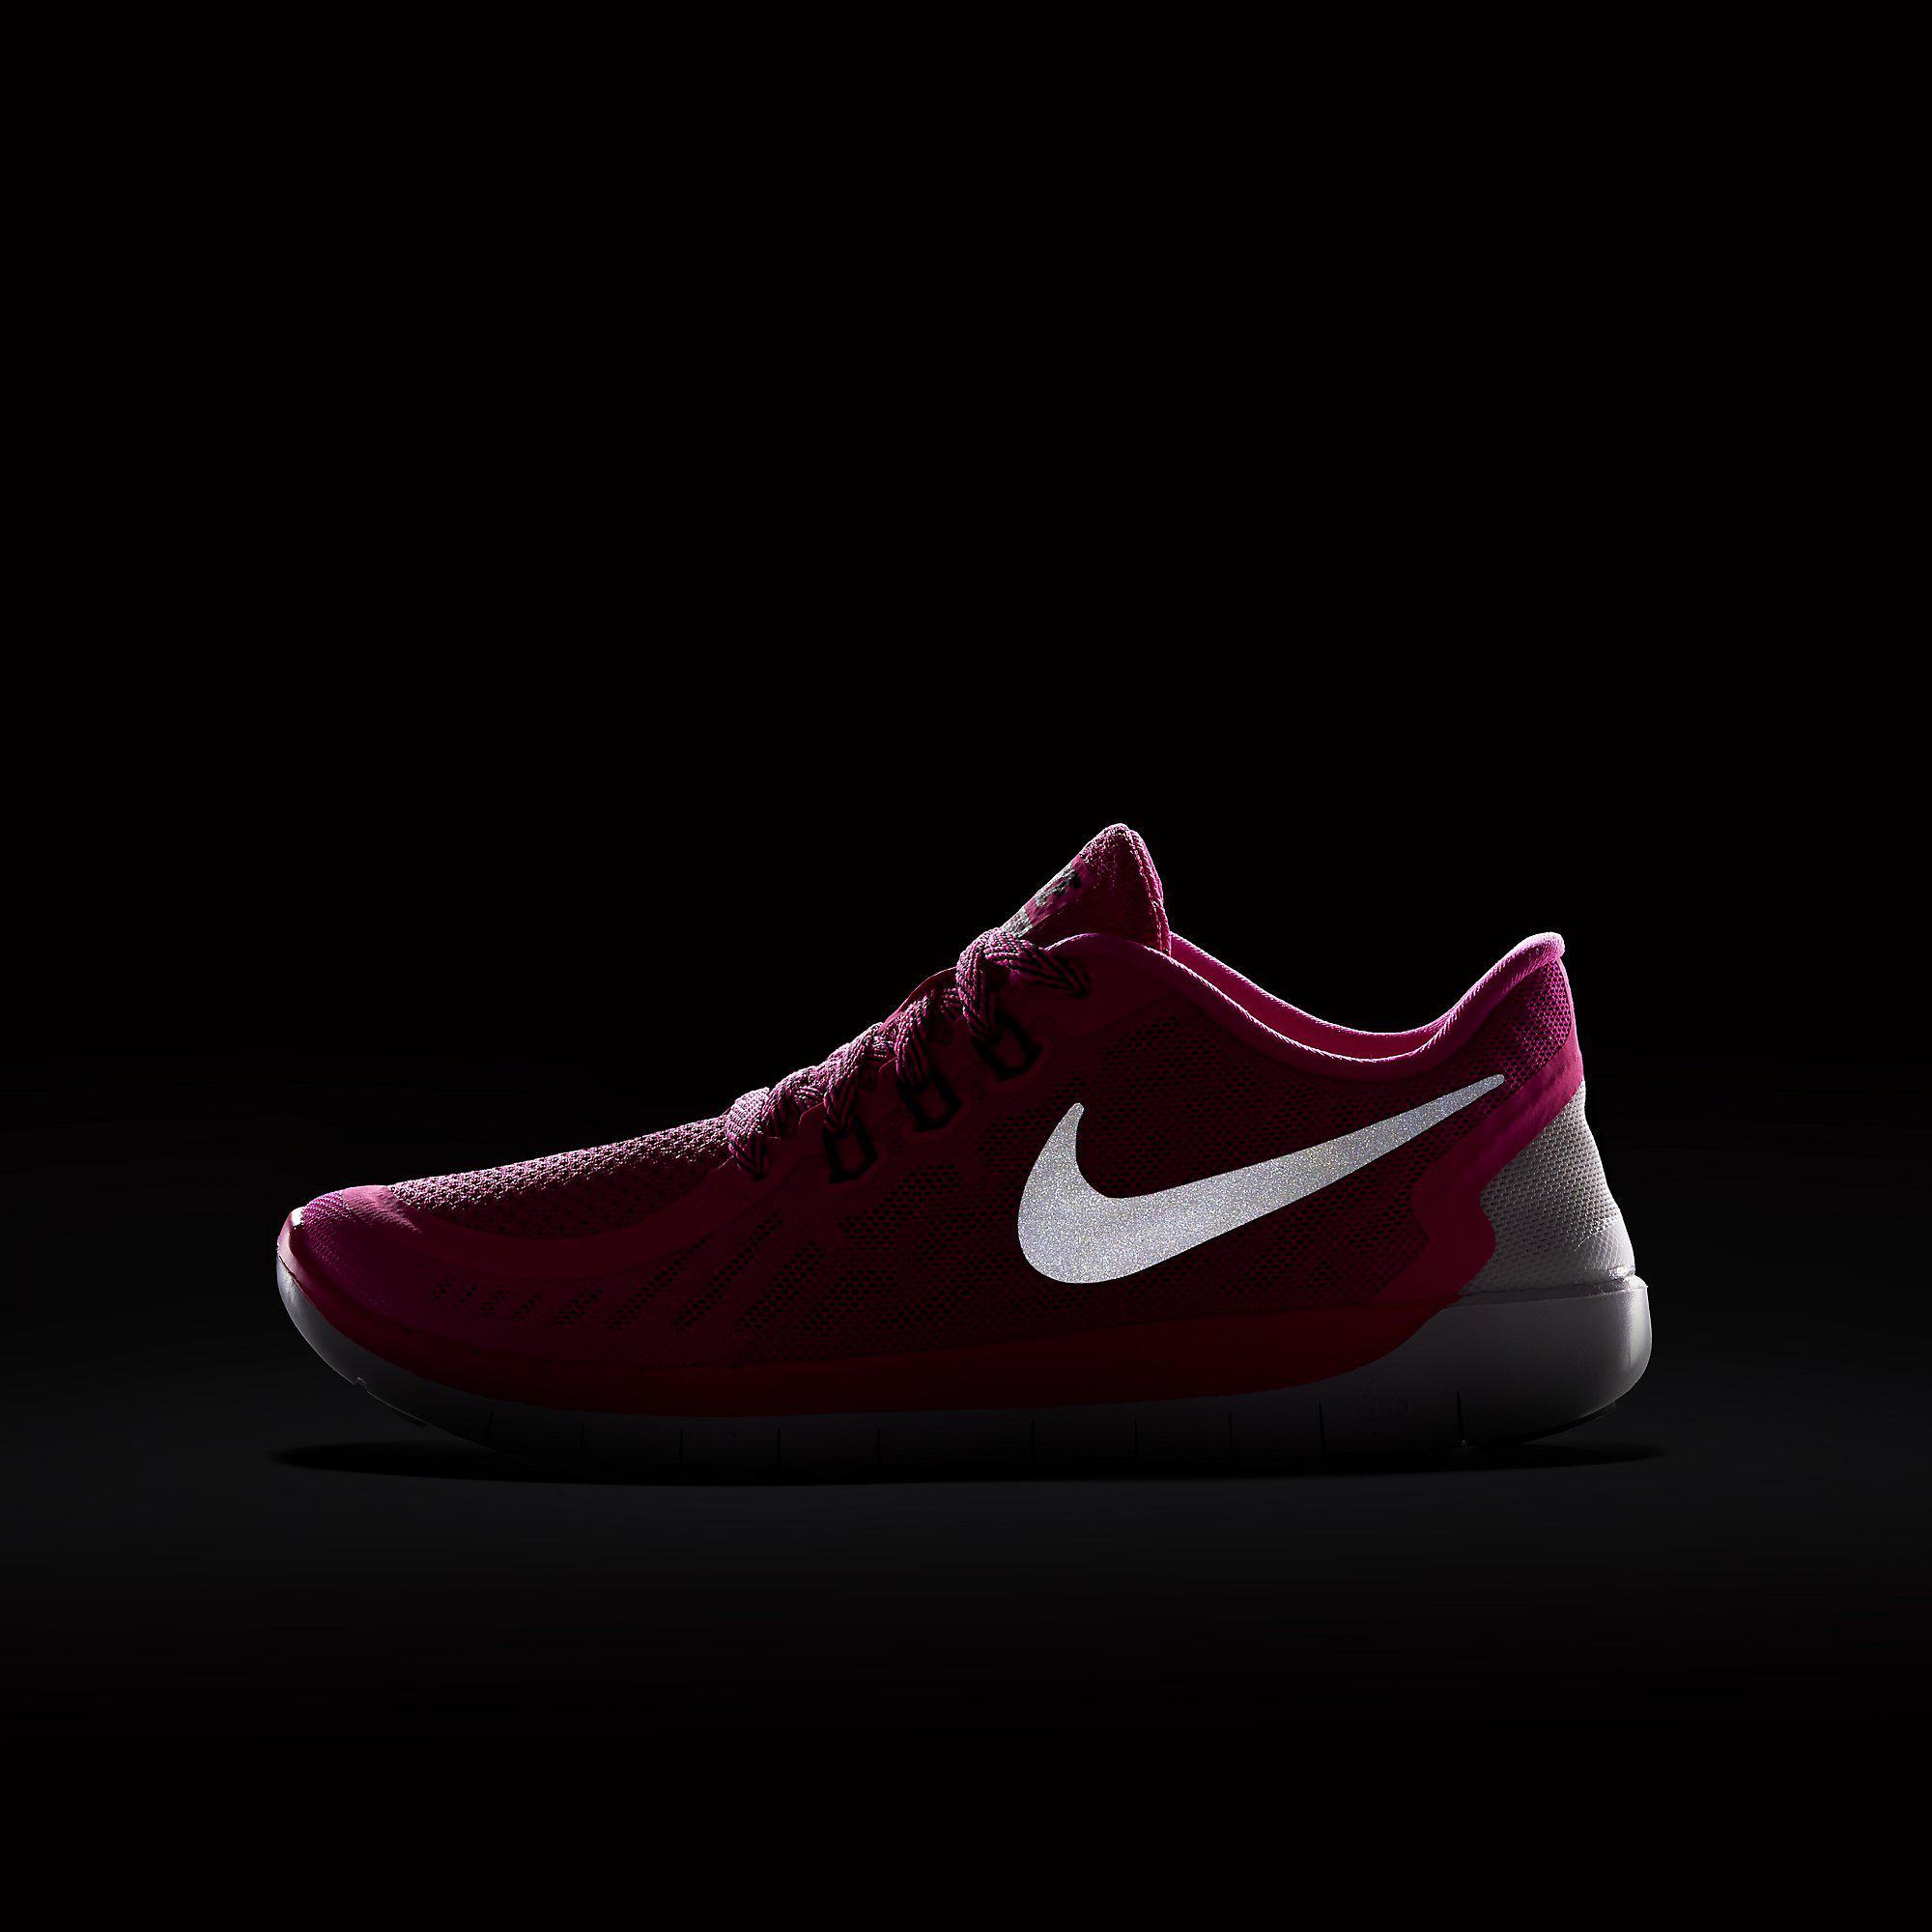 1f95aa199870 Nike Girls Free 5.0 Running Shoes - Pink Pow Vivid Pink - Tennisnuts.com